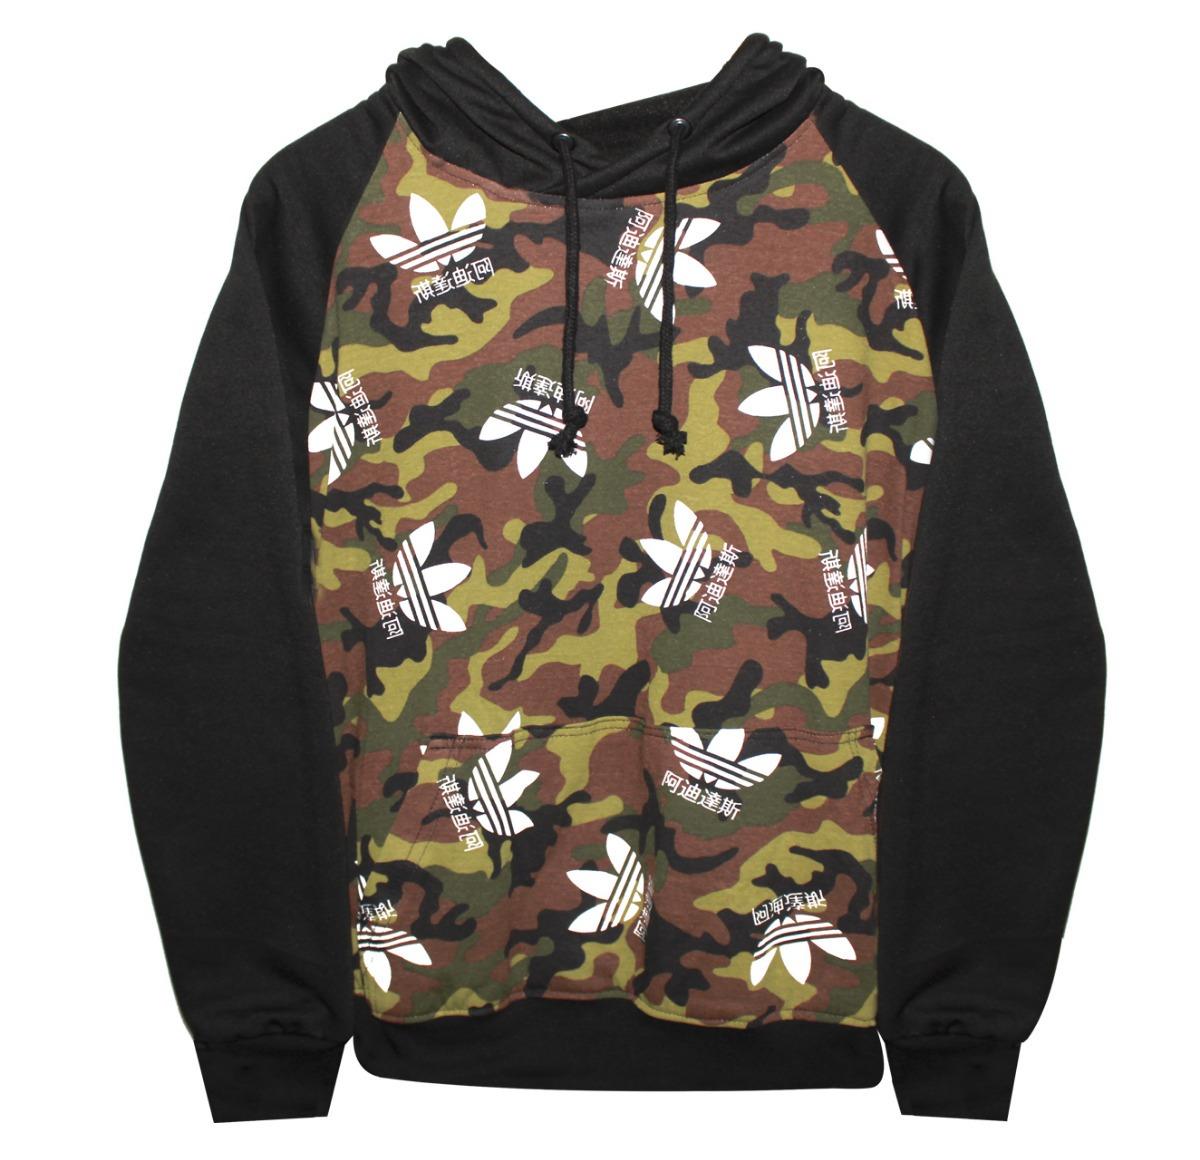 Camuflaje Letras Swag Militar 00 Moda Sudadera Hype Adidas 395 6Bqqd1